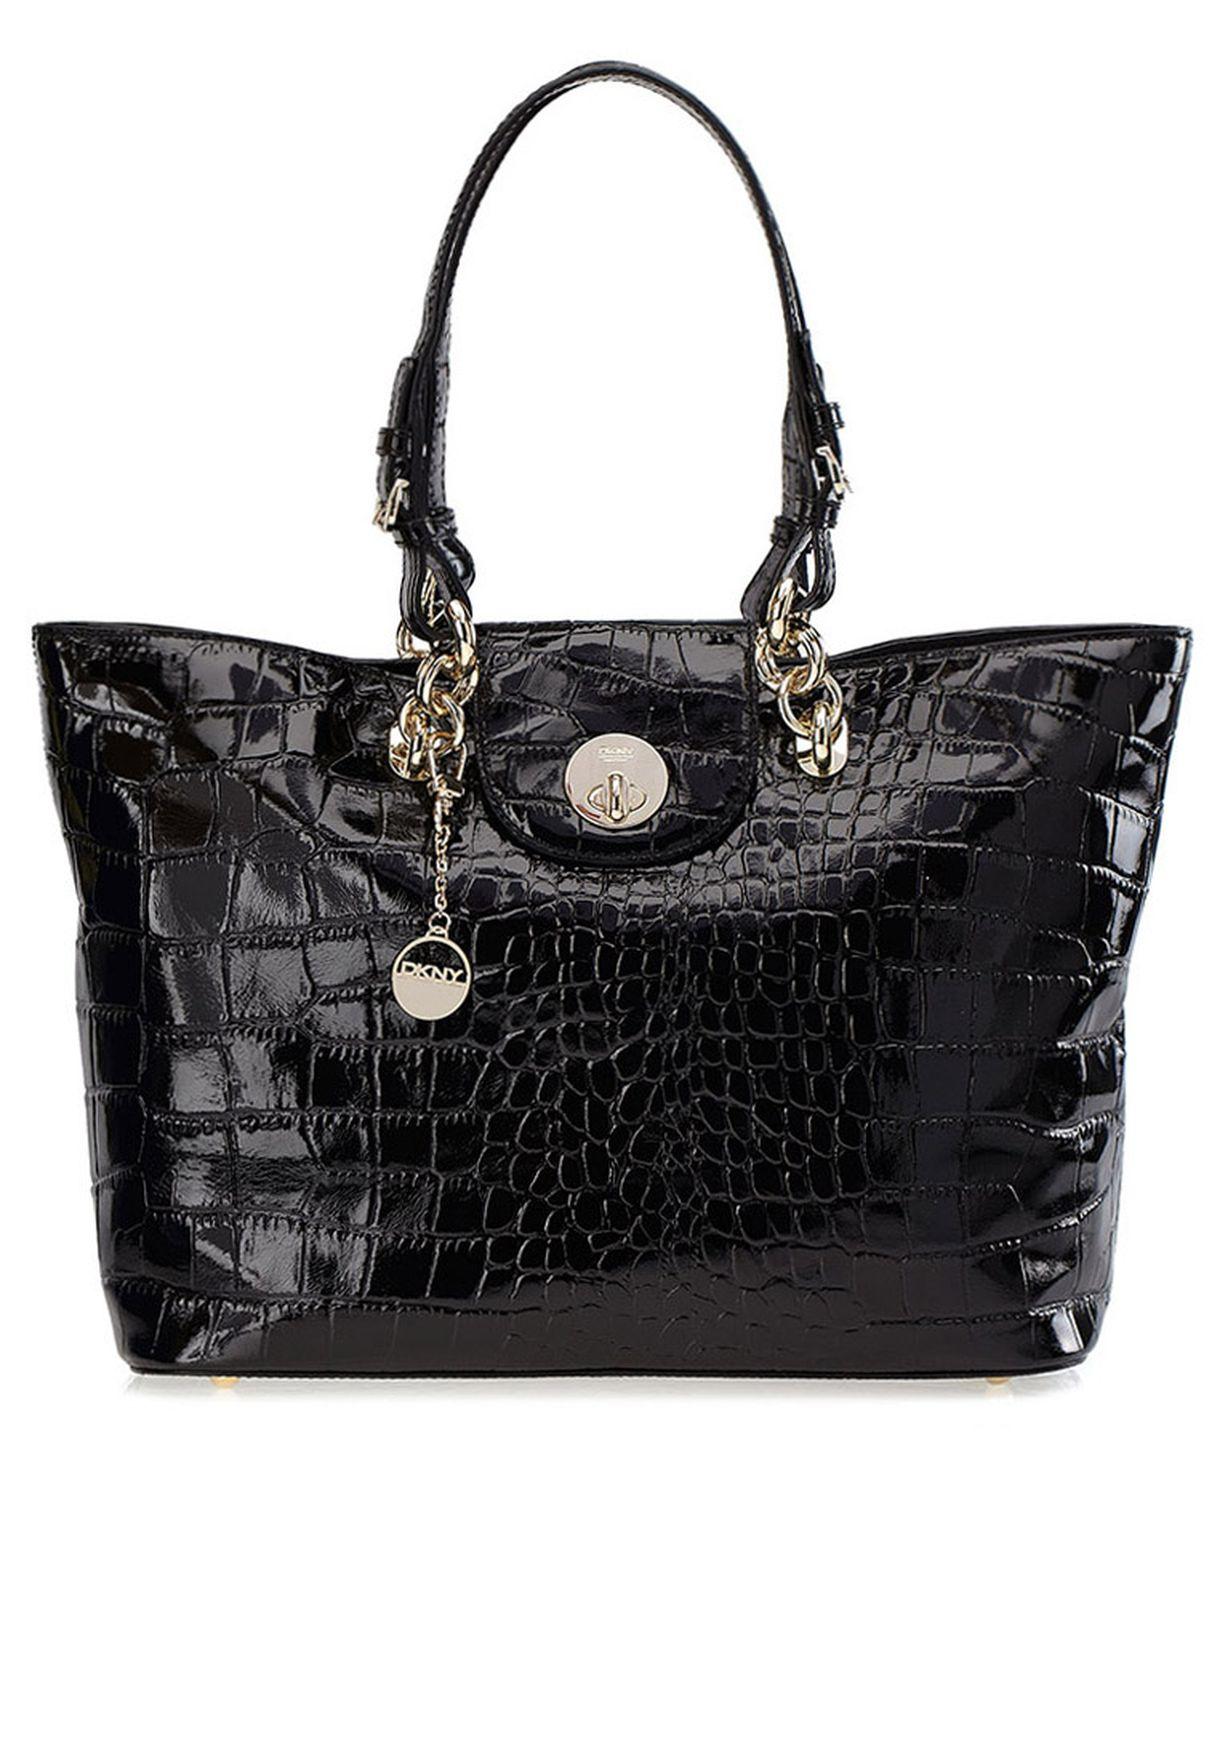 Compra Buckle para R2314204 Dkny Black Arabia en Saudita Shopper Lock Tote mujeres Twist Ew Dk790ac22ajp ZFZIrxgaqw